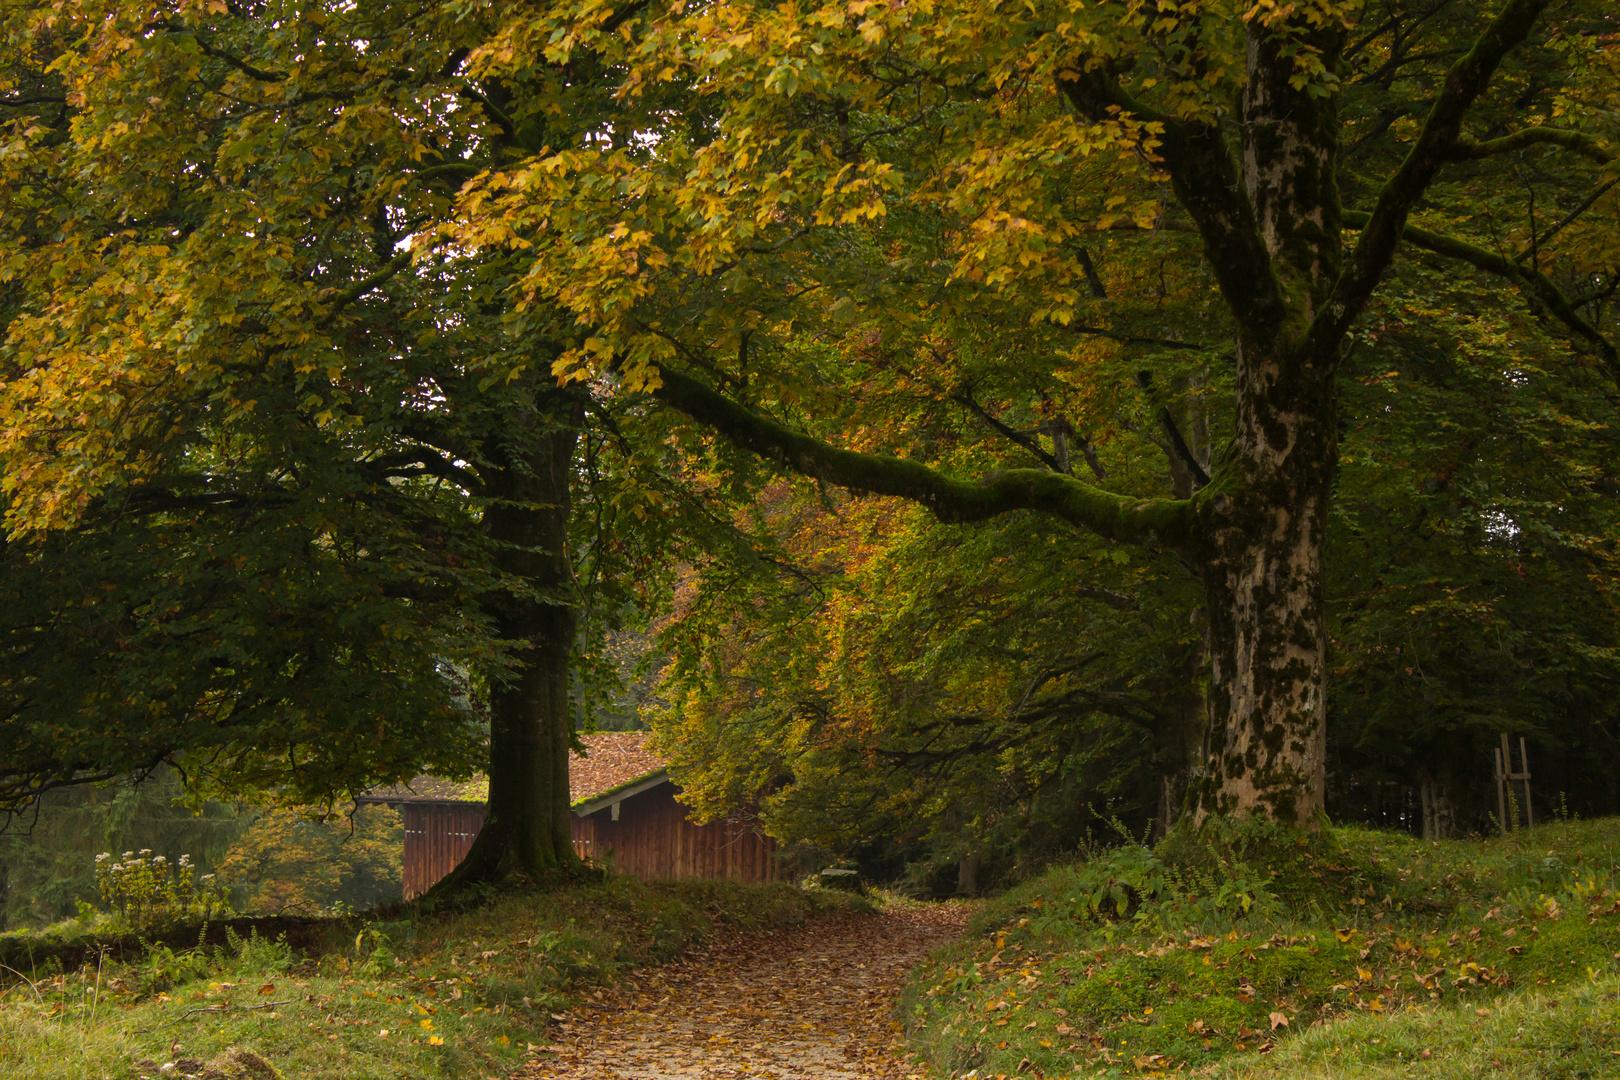 Haus unter den Bäumen.